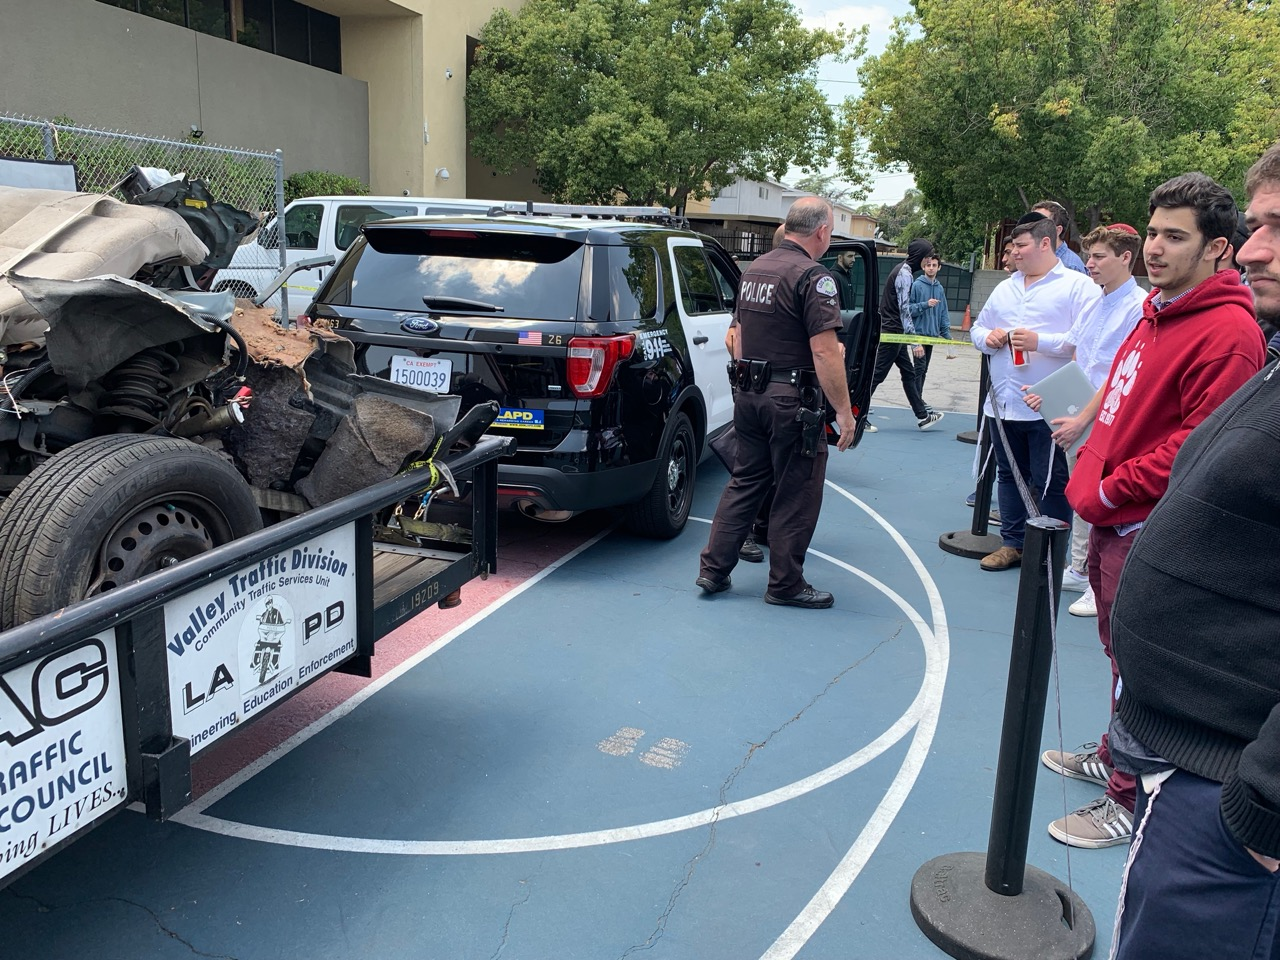 LAPD Visit Today | VTHS Blog